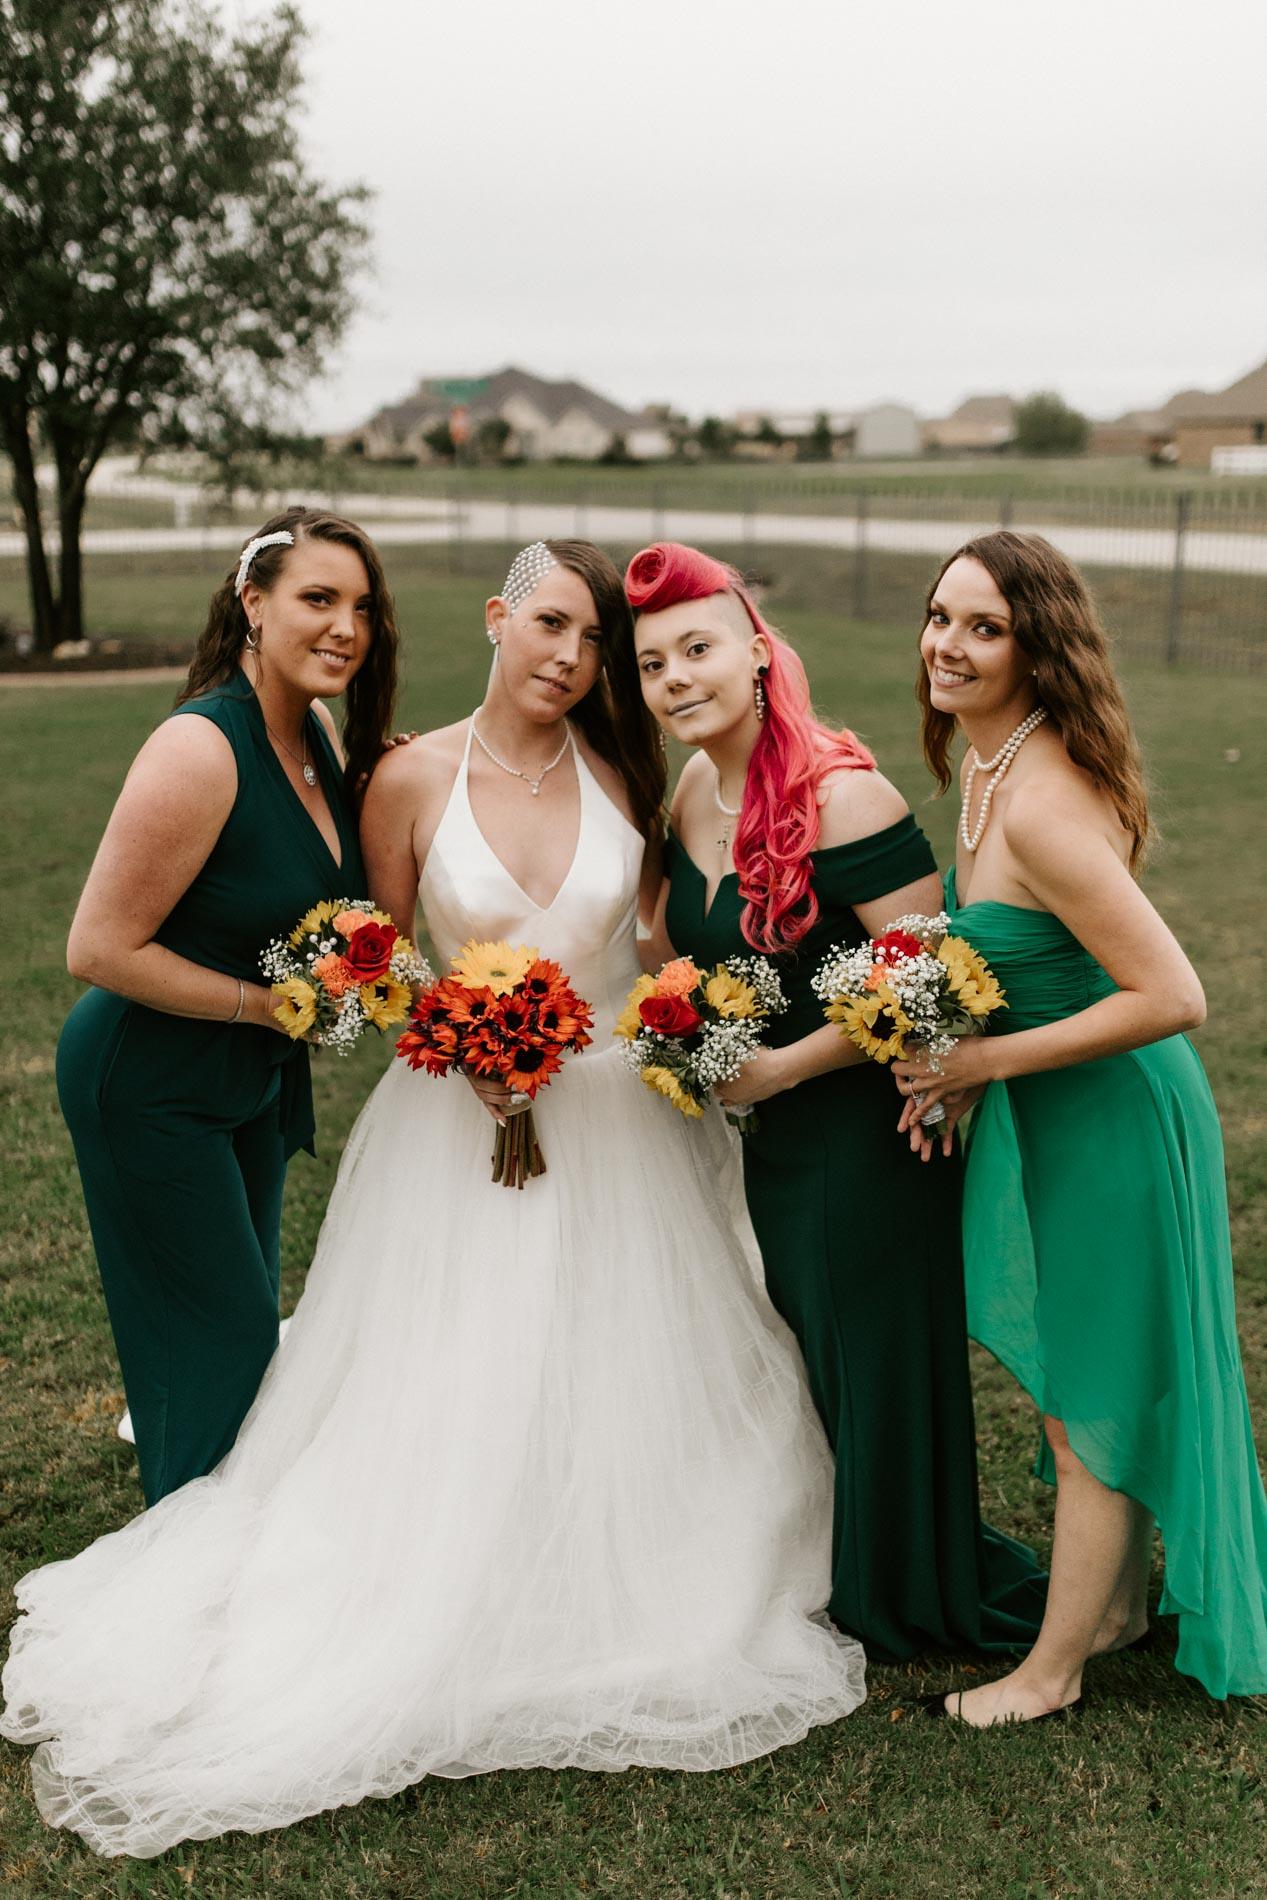 Unique wedding bridal party bridesmaids green dresses